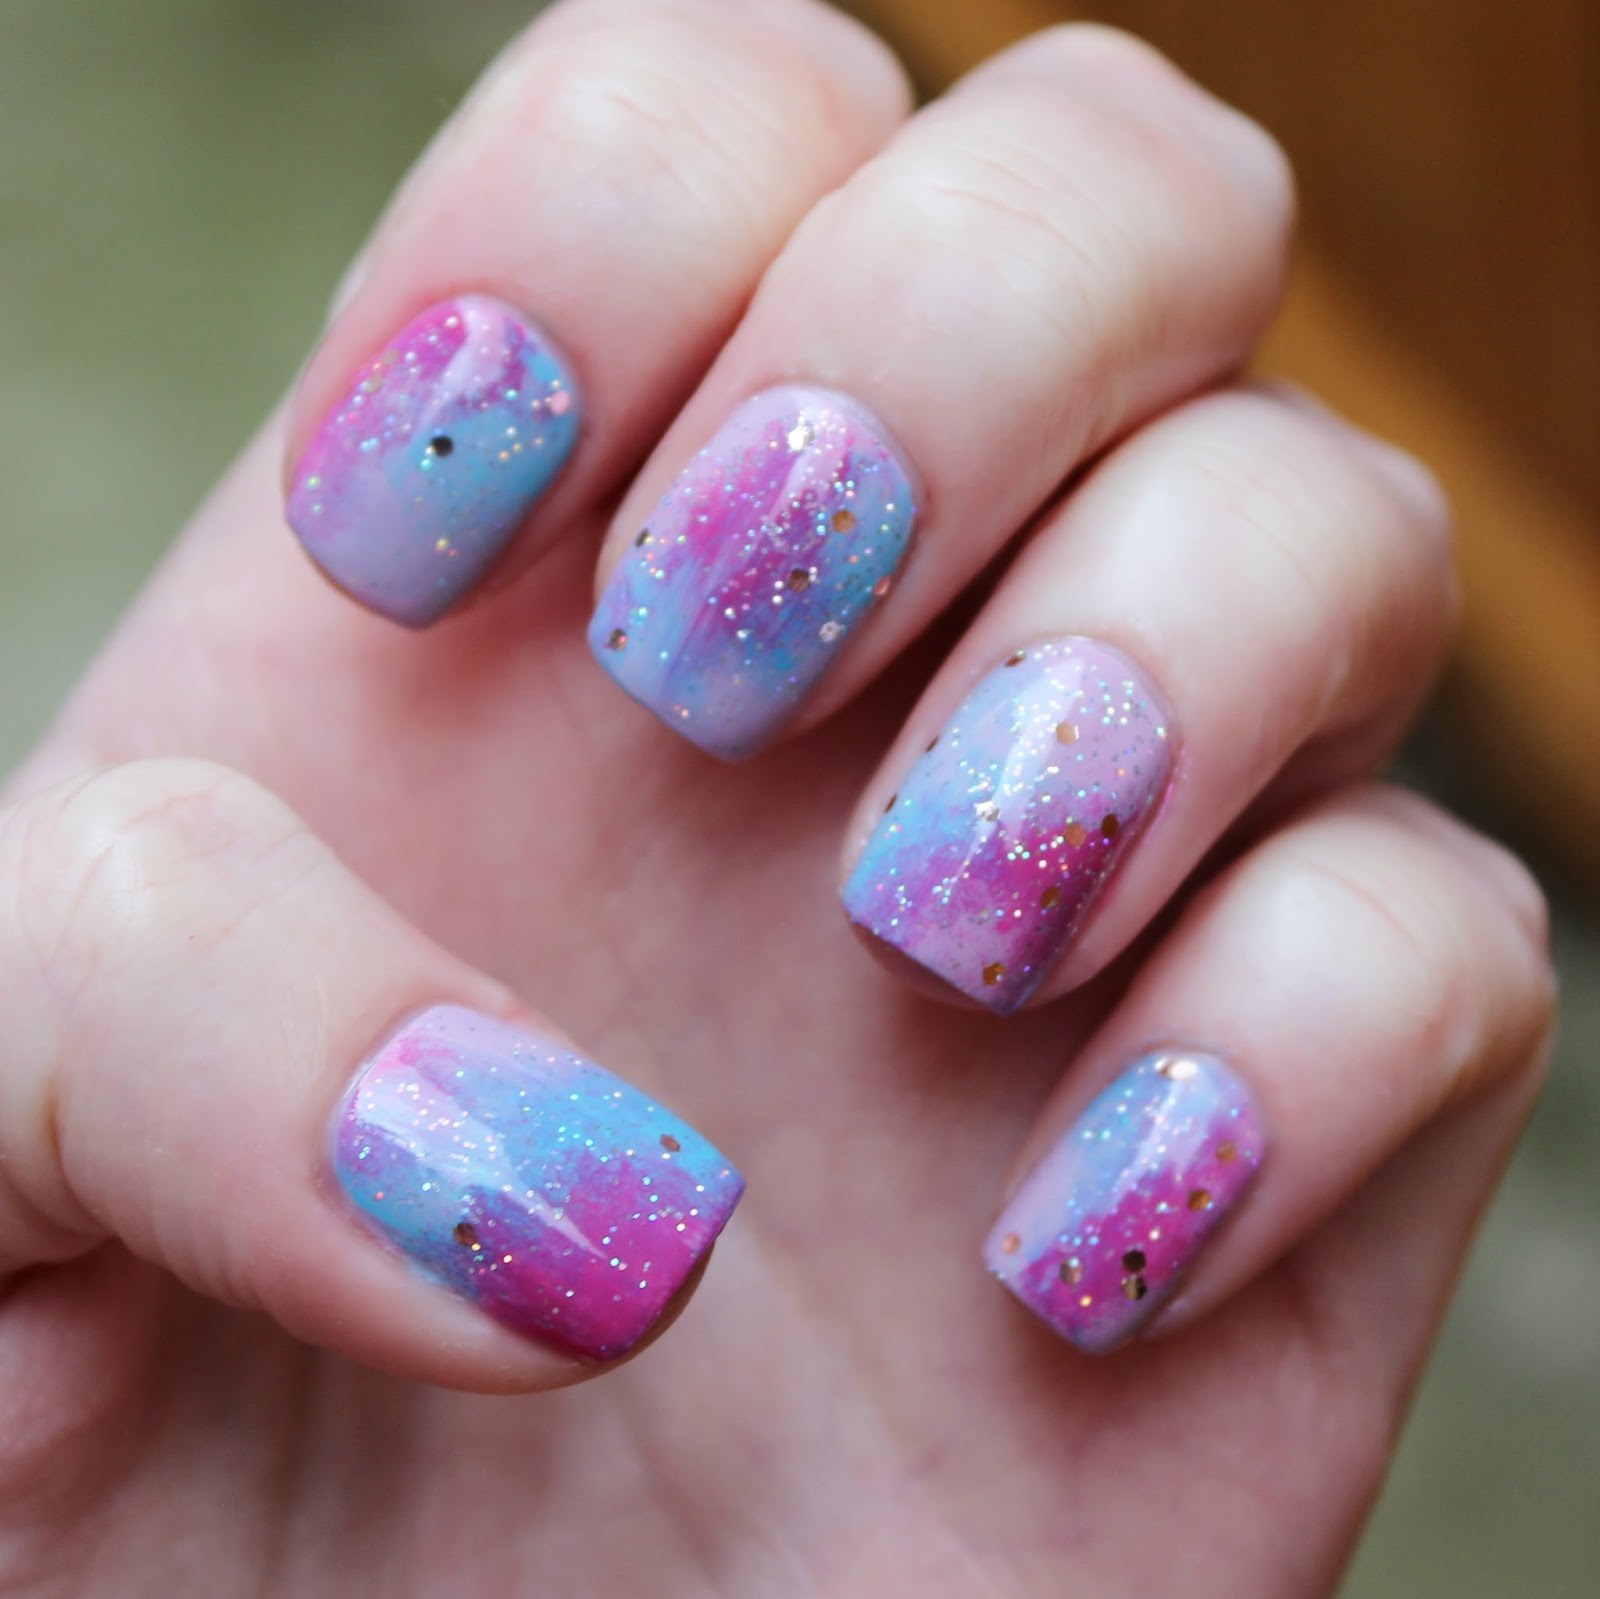 Dahlia Nails: June 2015